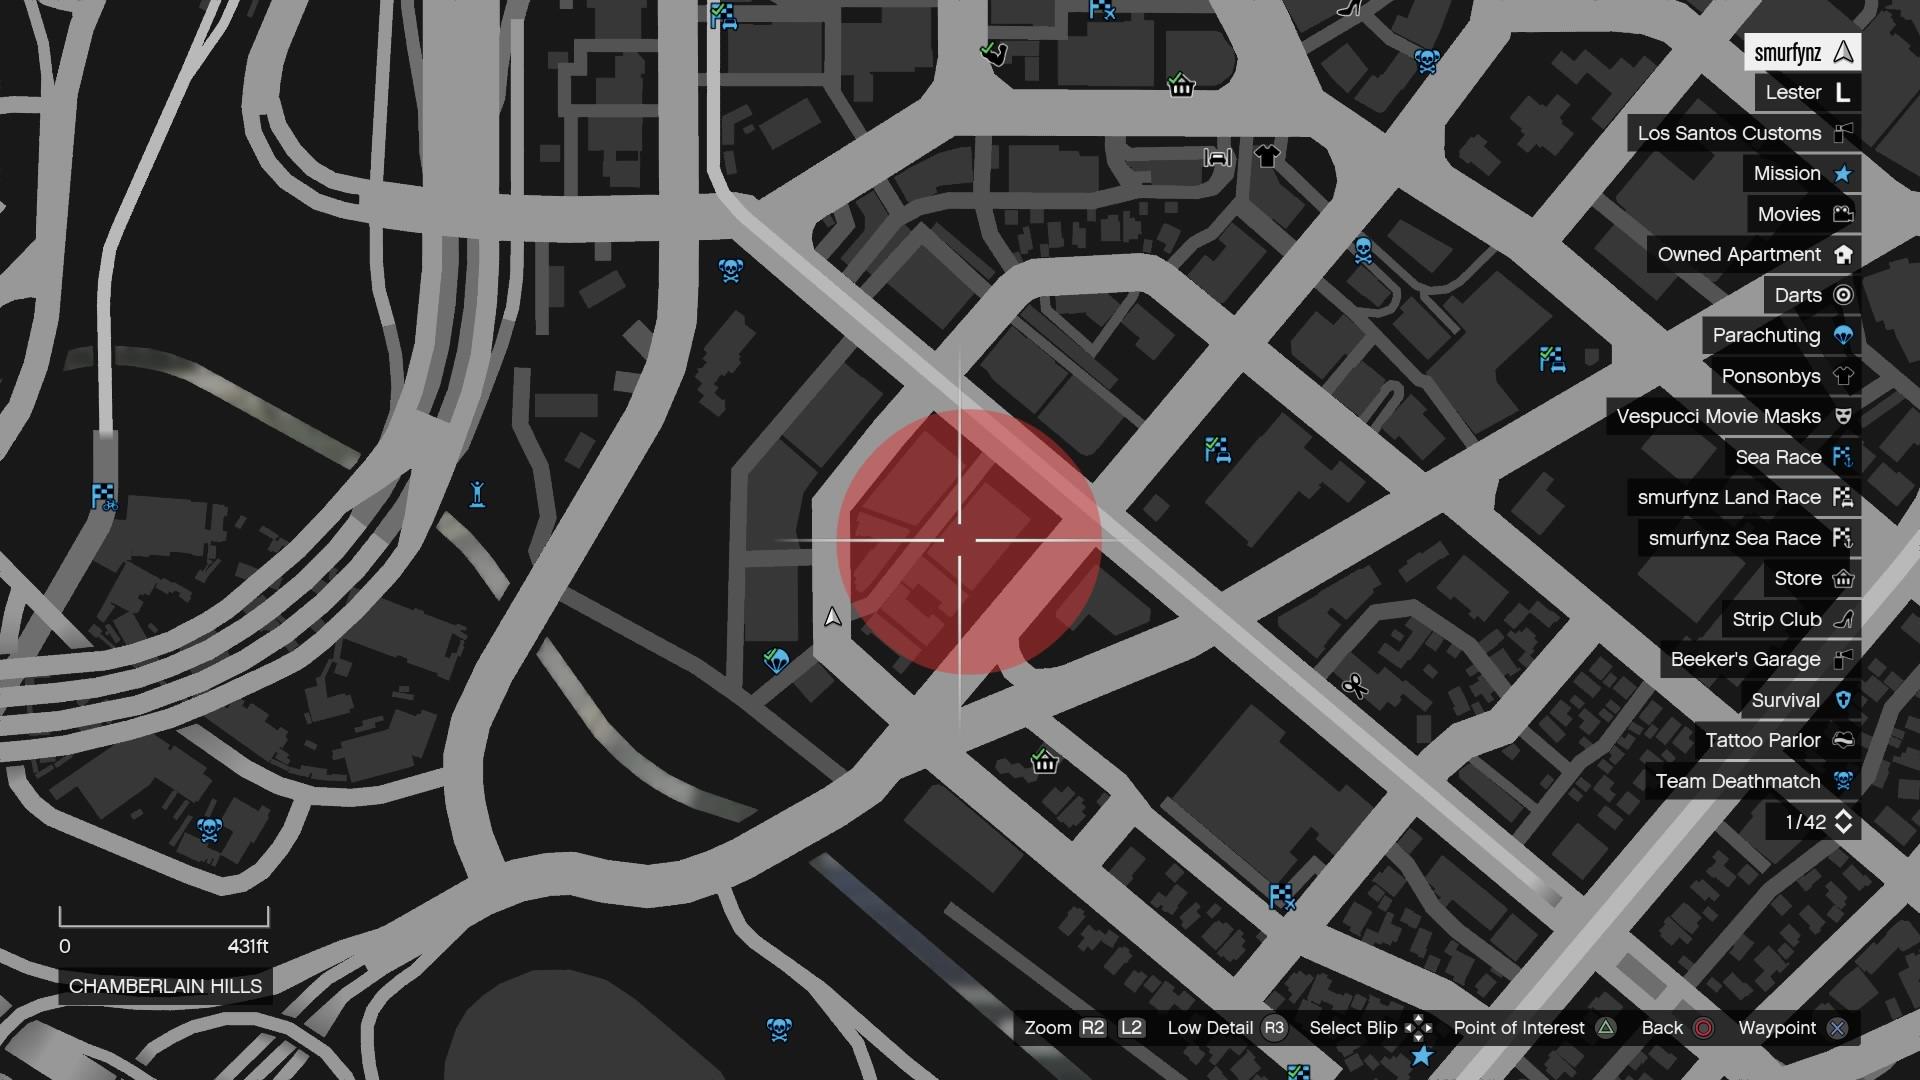 Карта бандитских разборок в гта 5